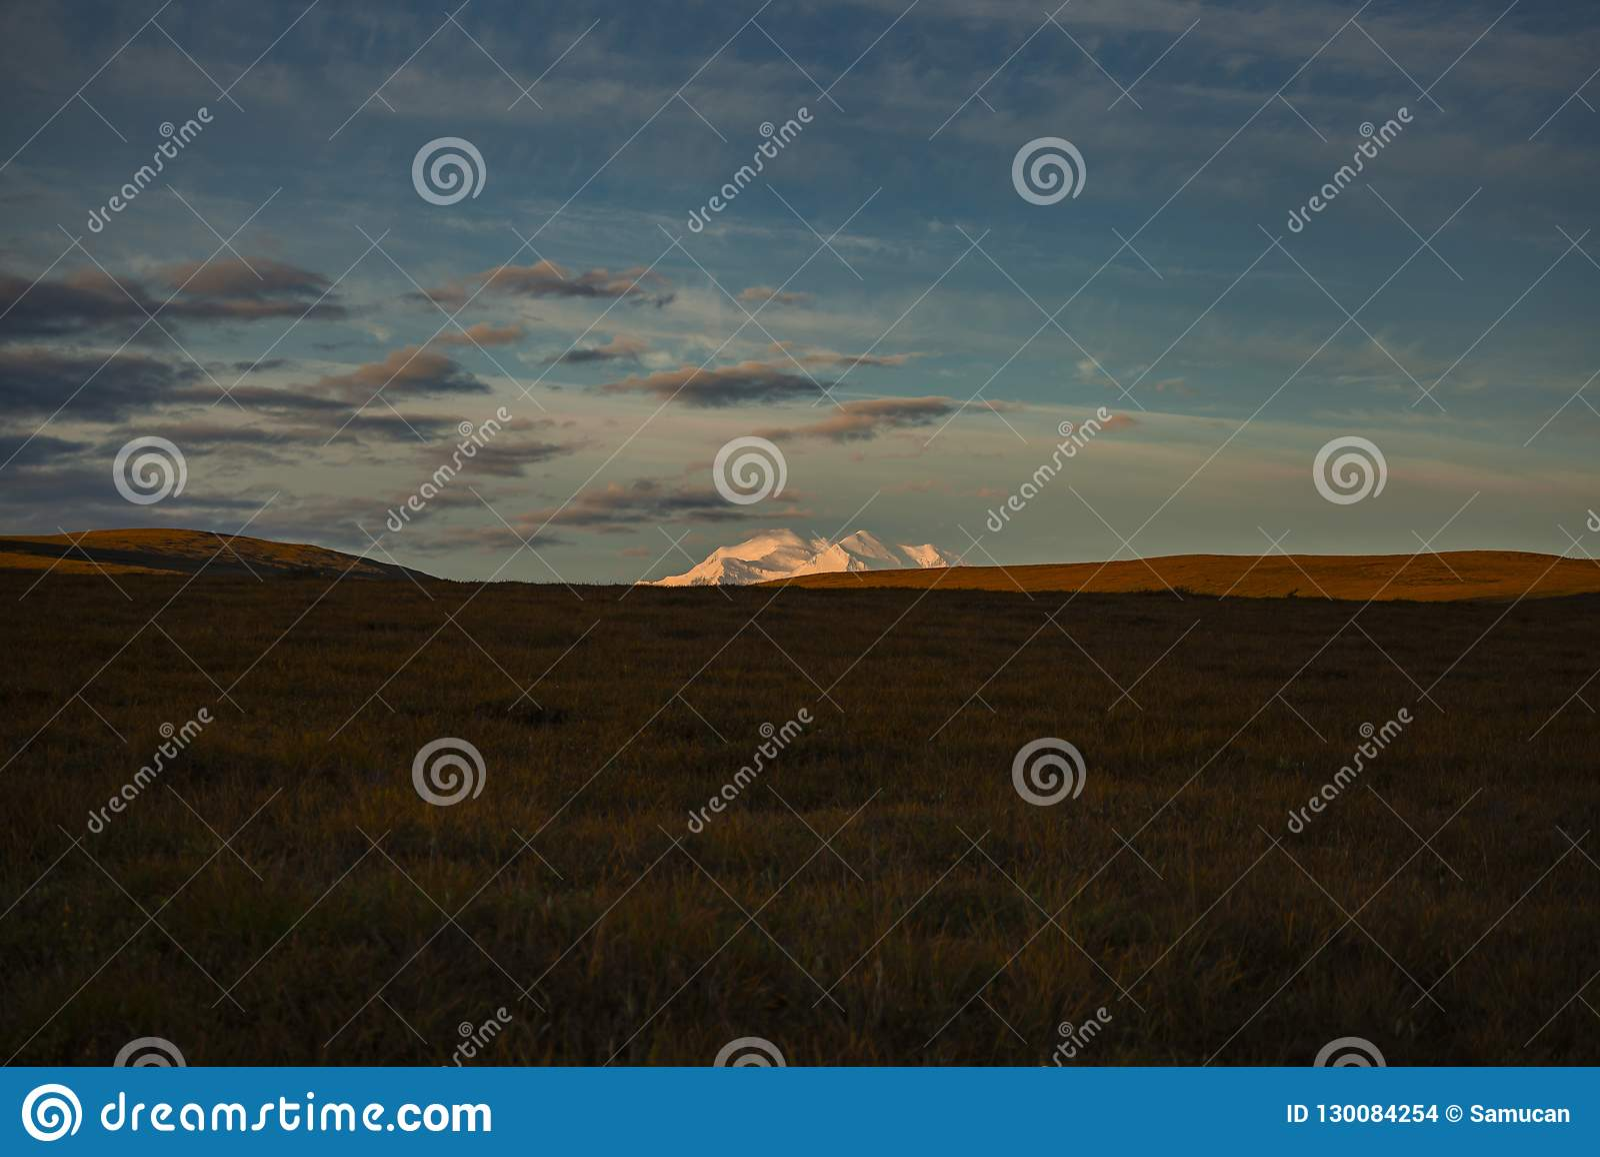 Peak of Denali in the early Morning